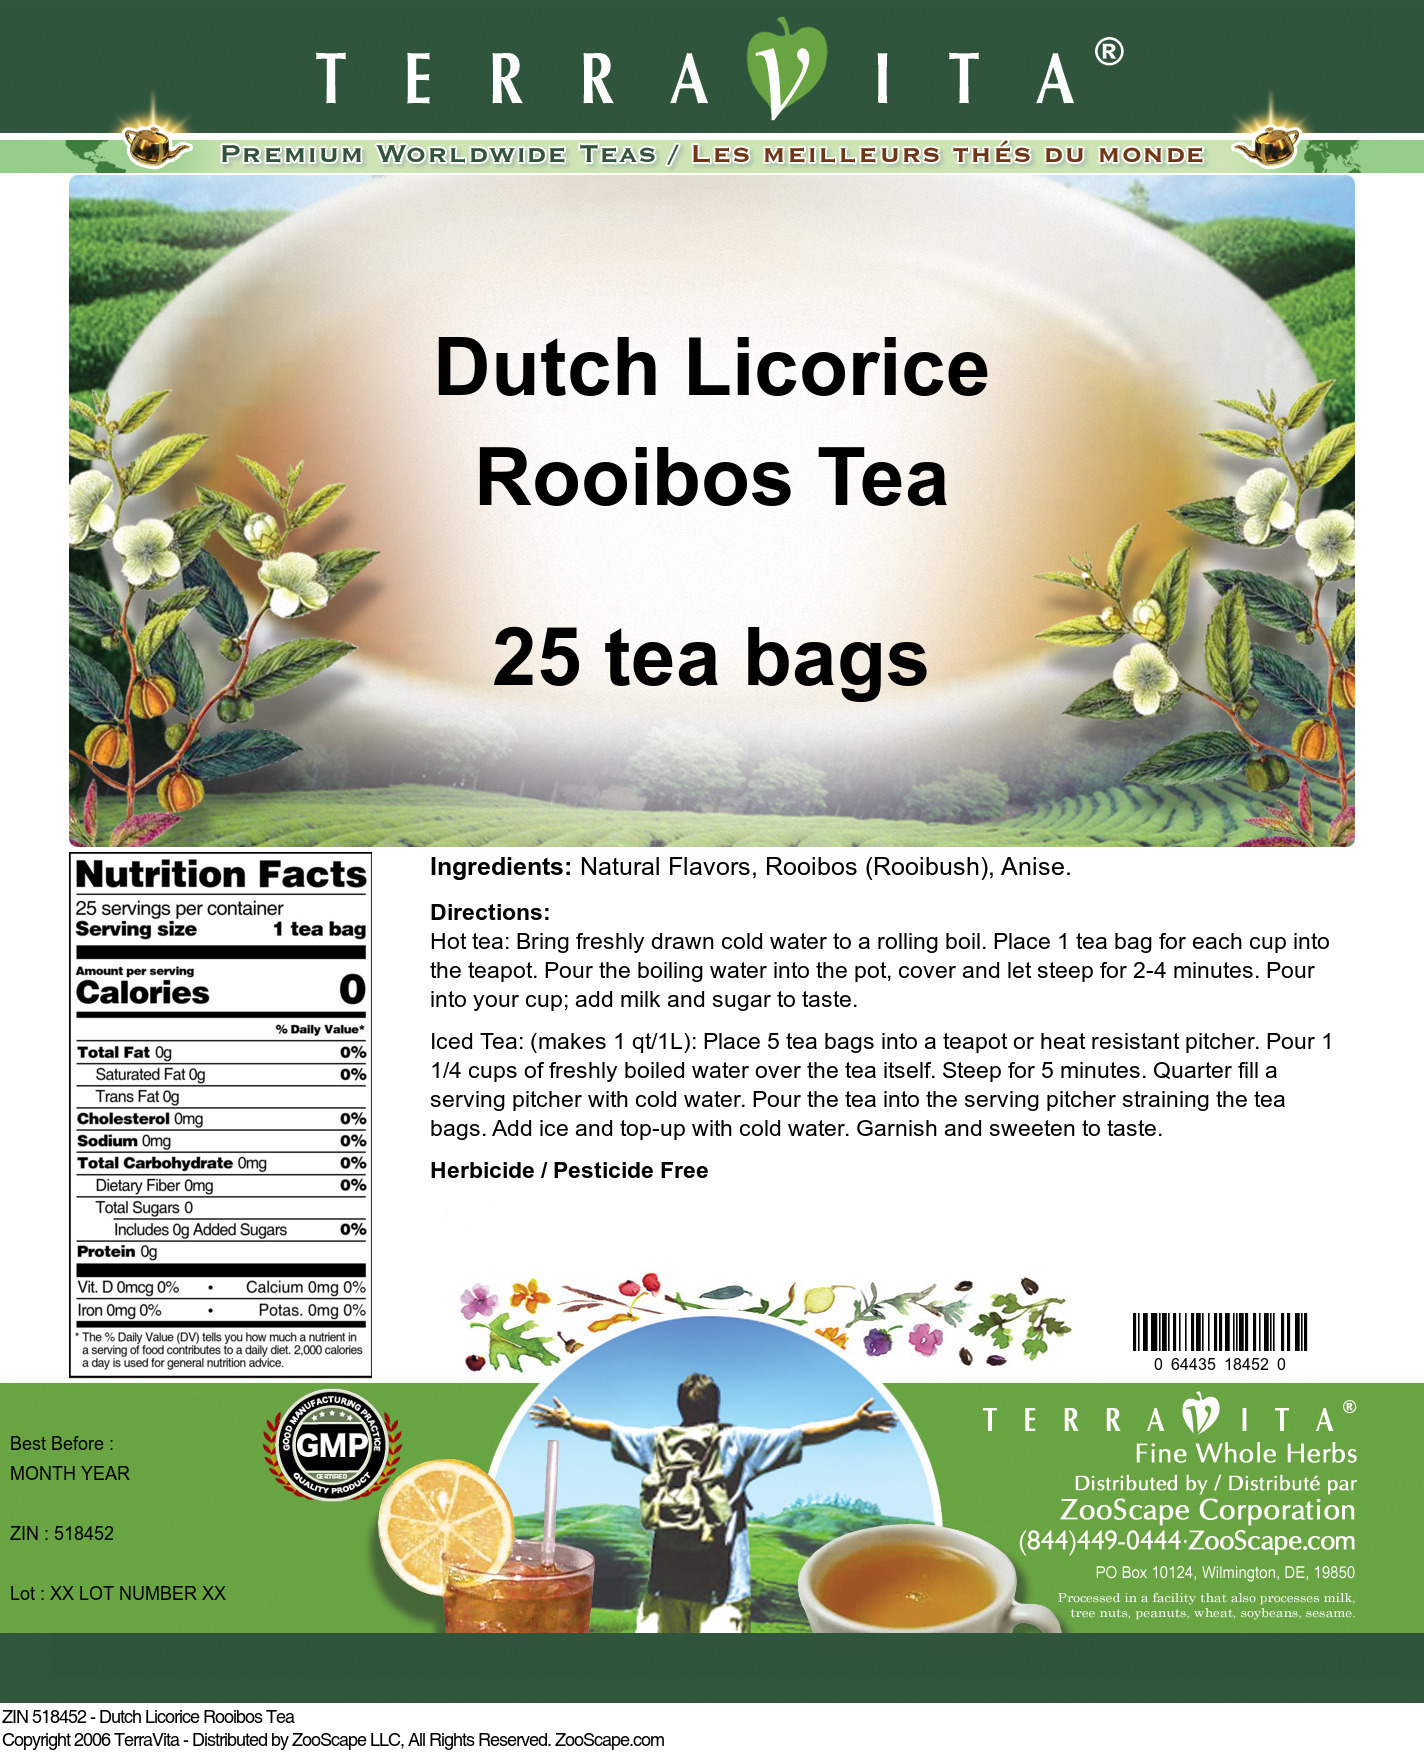 Dutch Licorice Rooibos Tea